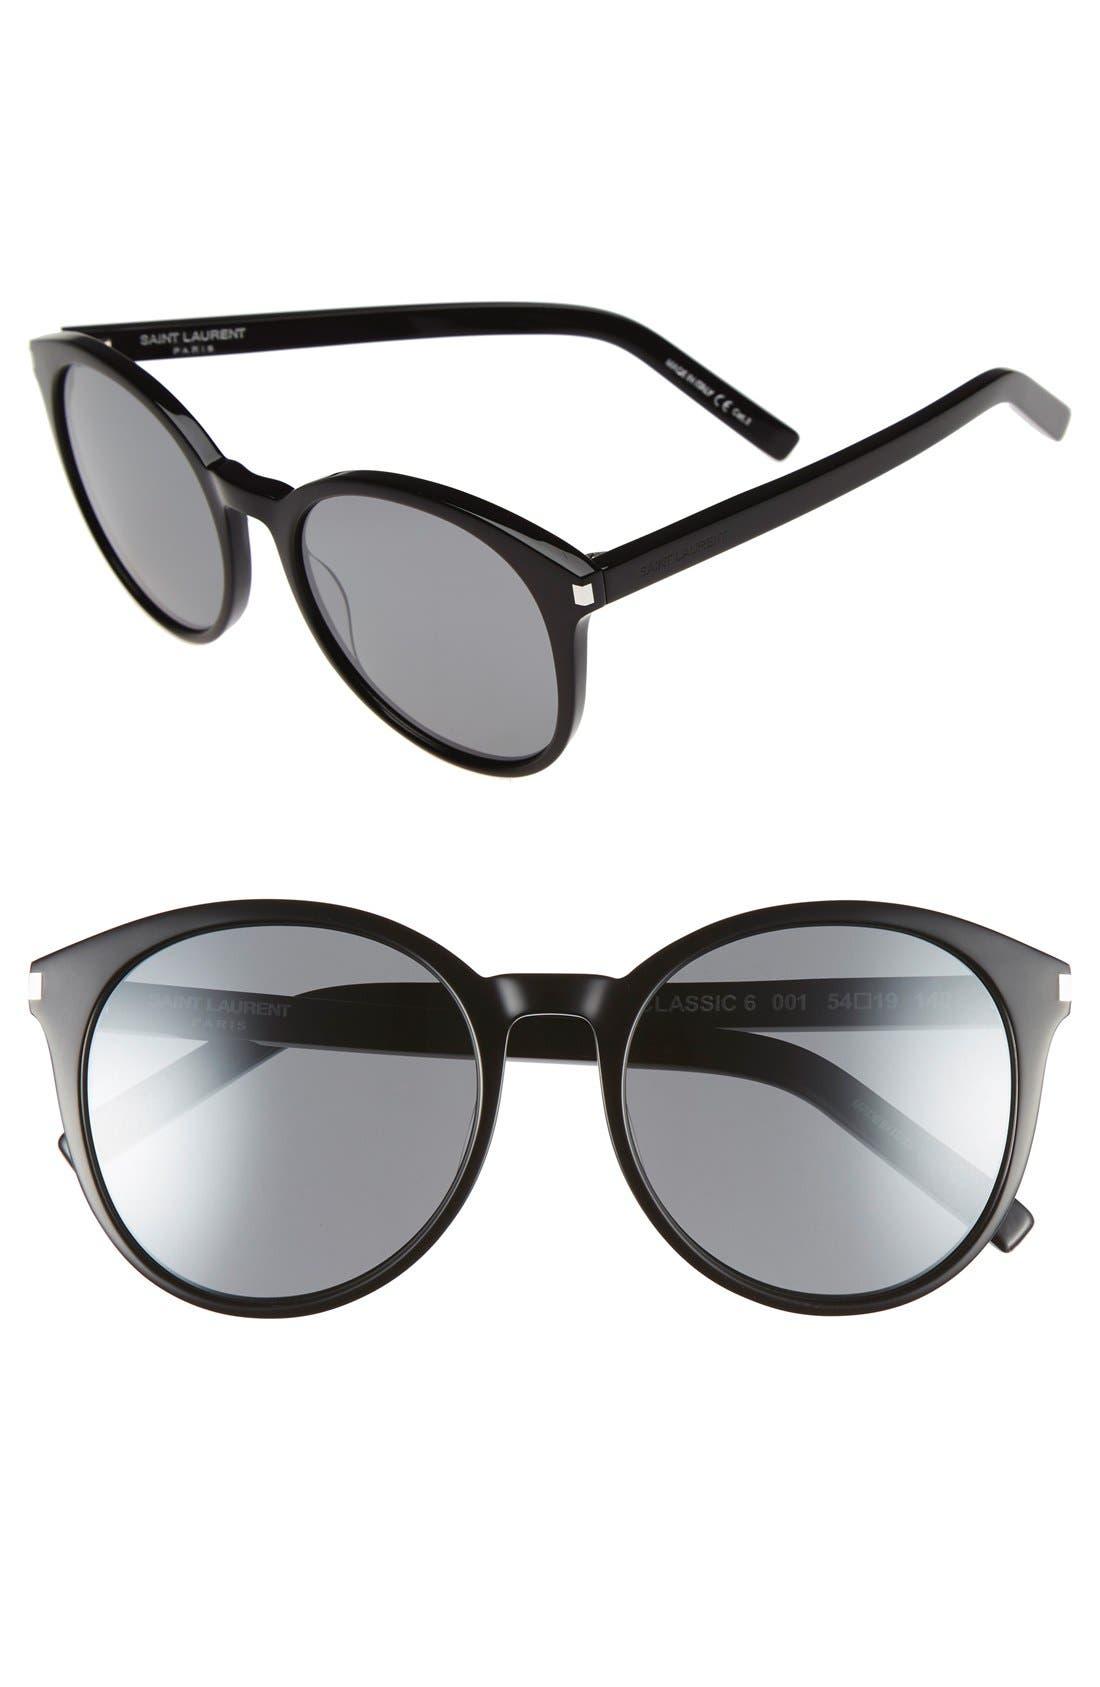 'Classic' 54mm Sunglasses,                             Main thumbnail 1, color,                             001